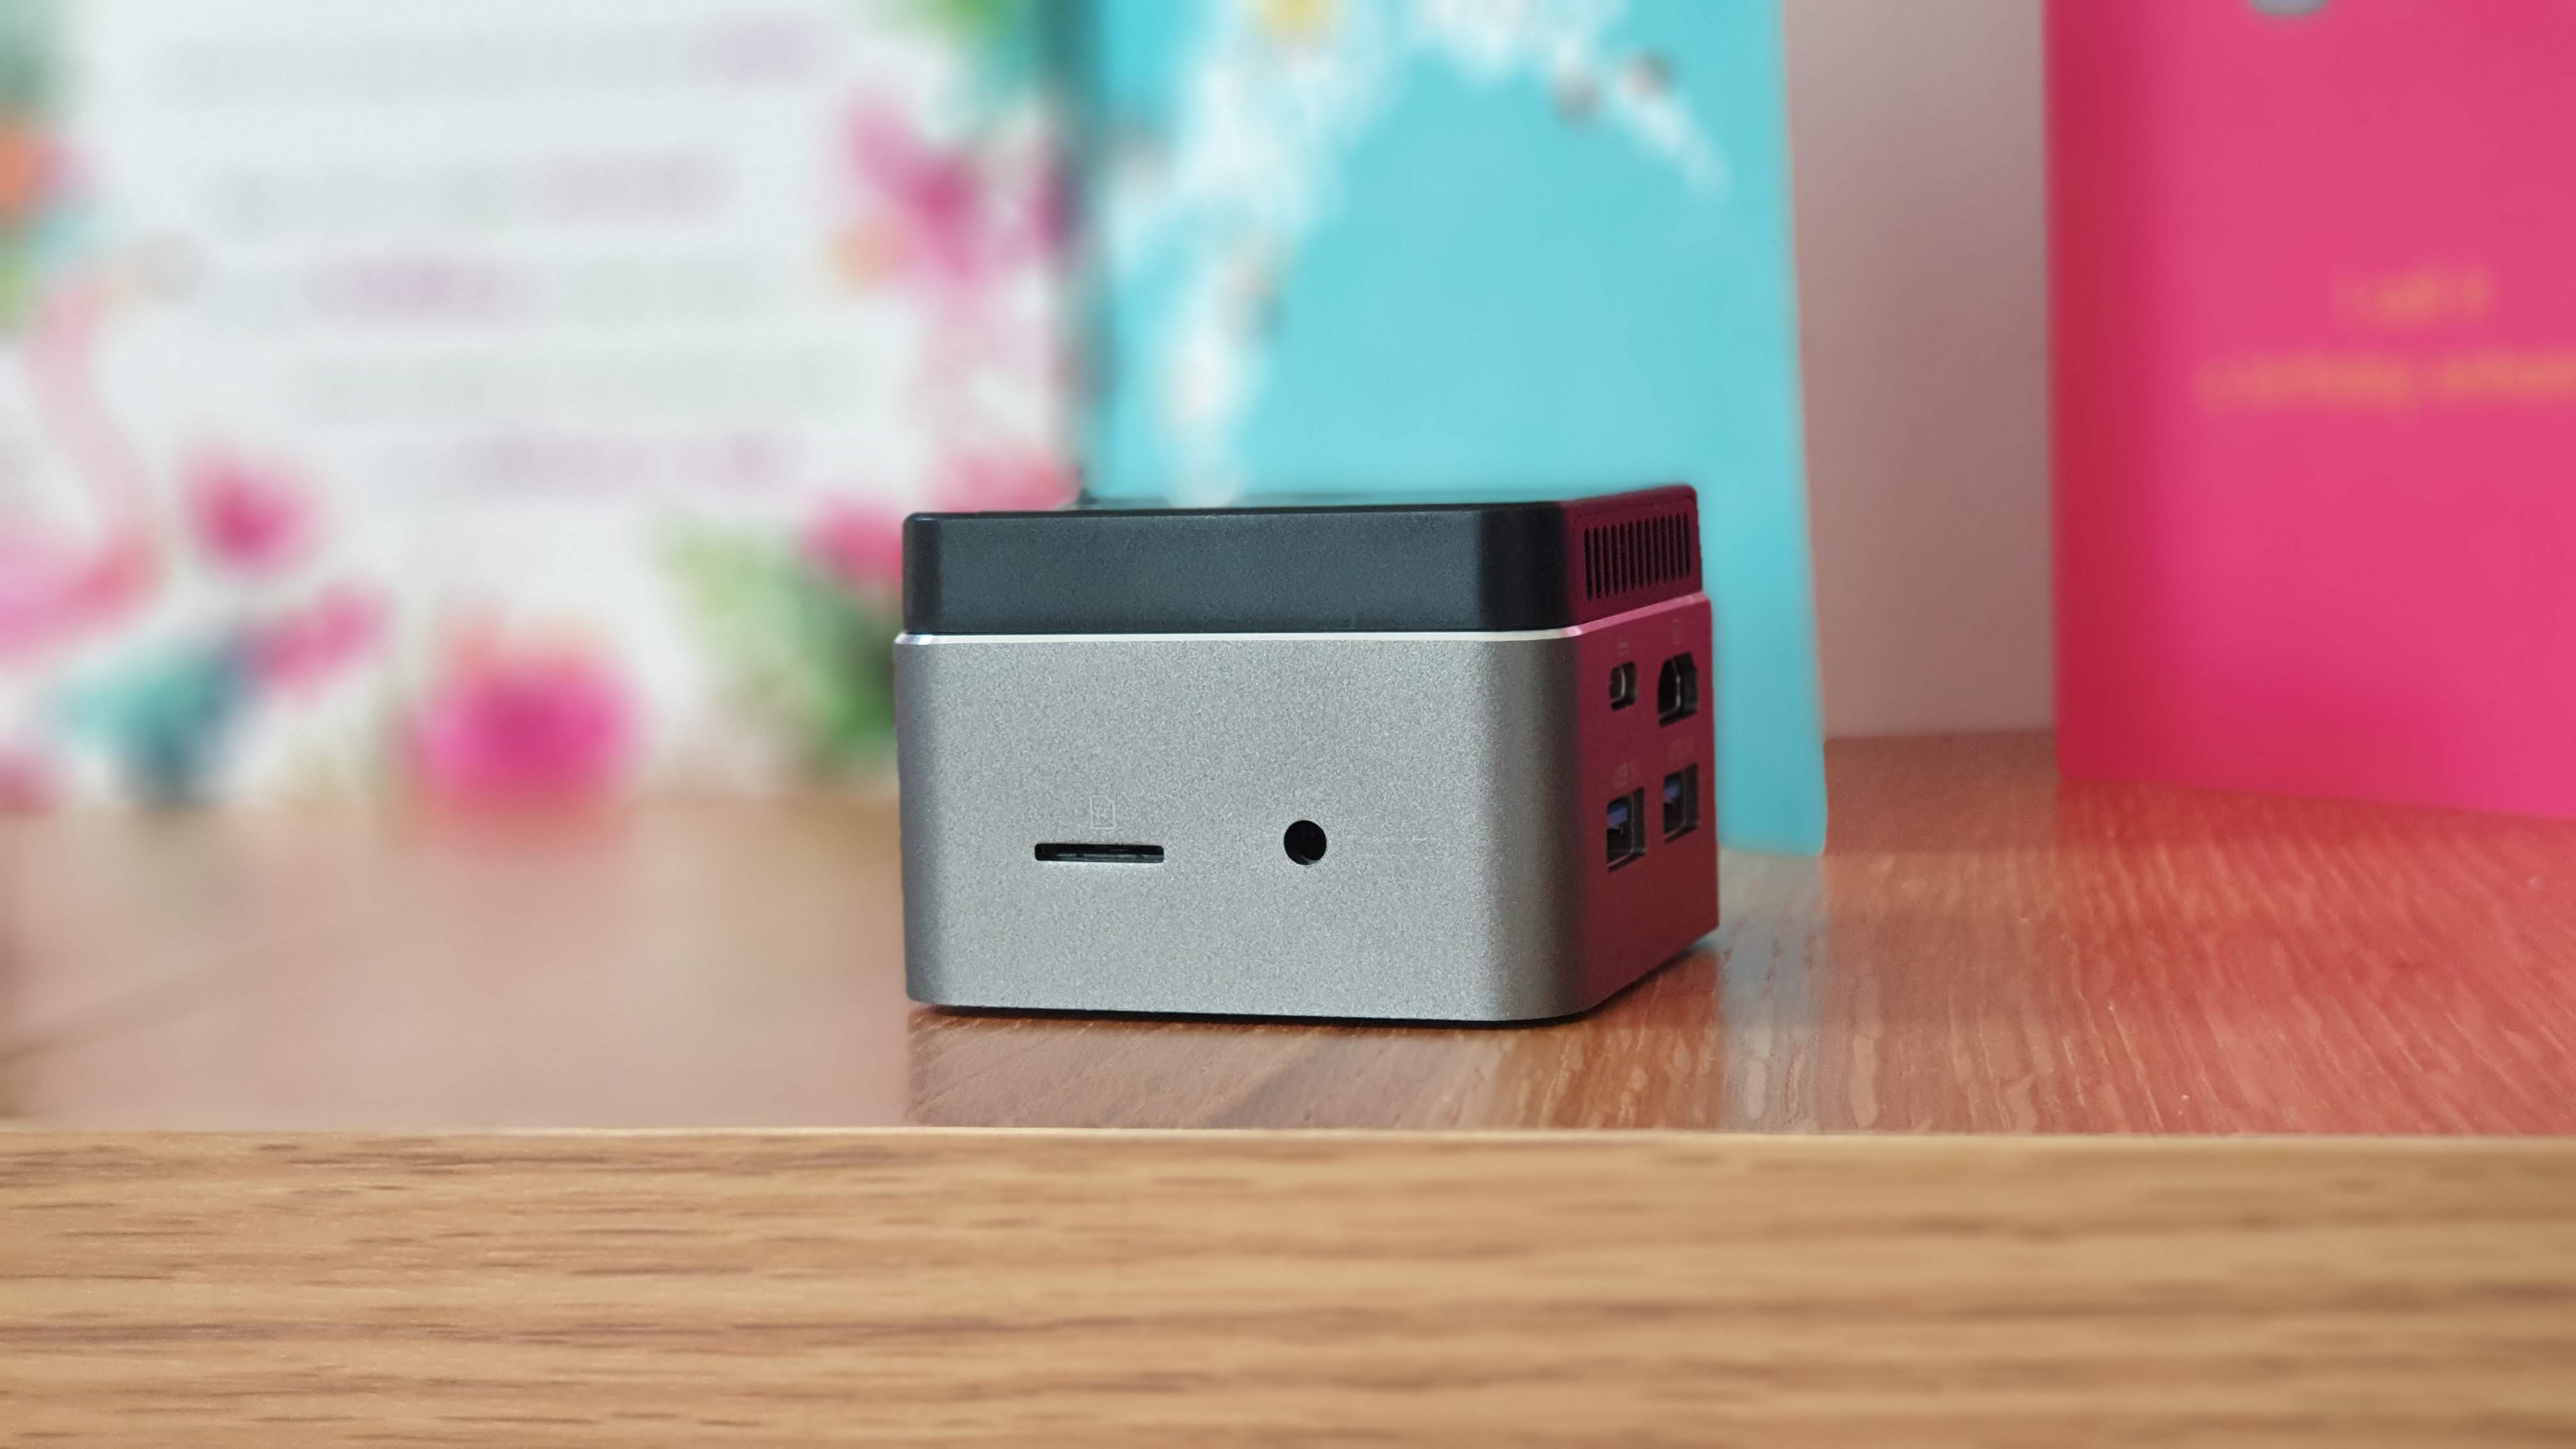 Audio Jack and MicroSD Card Reader